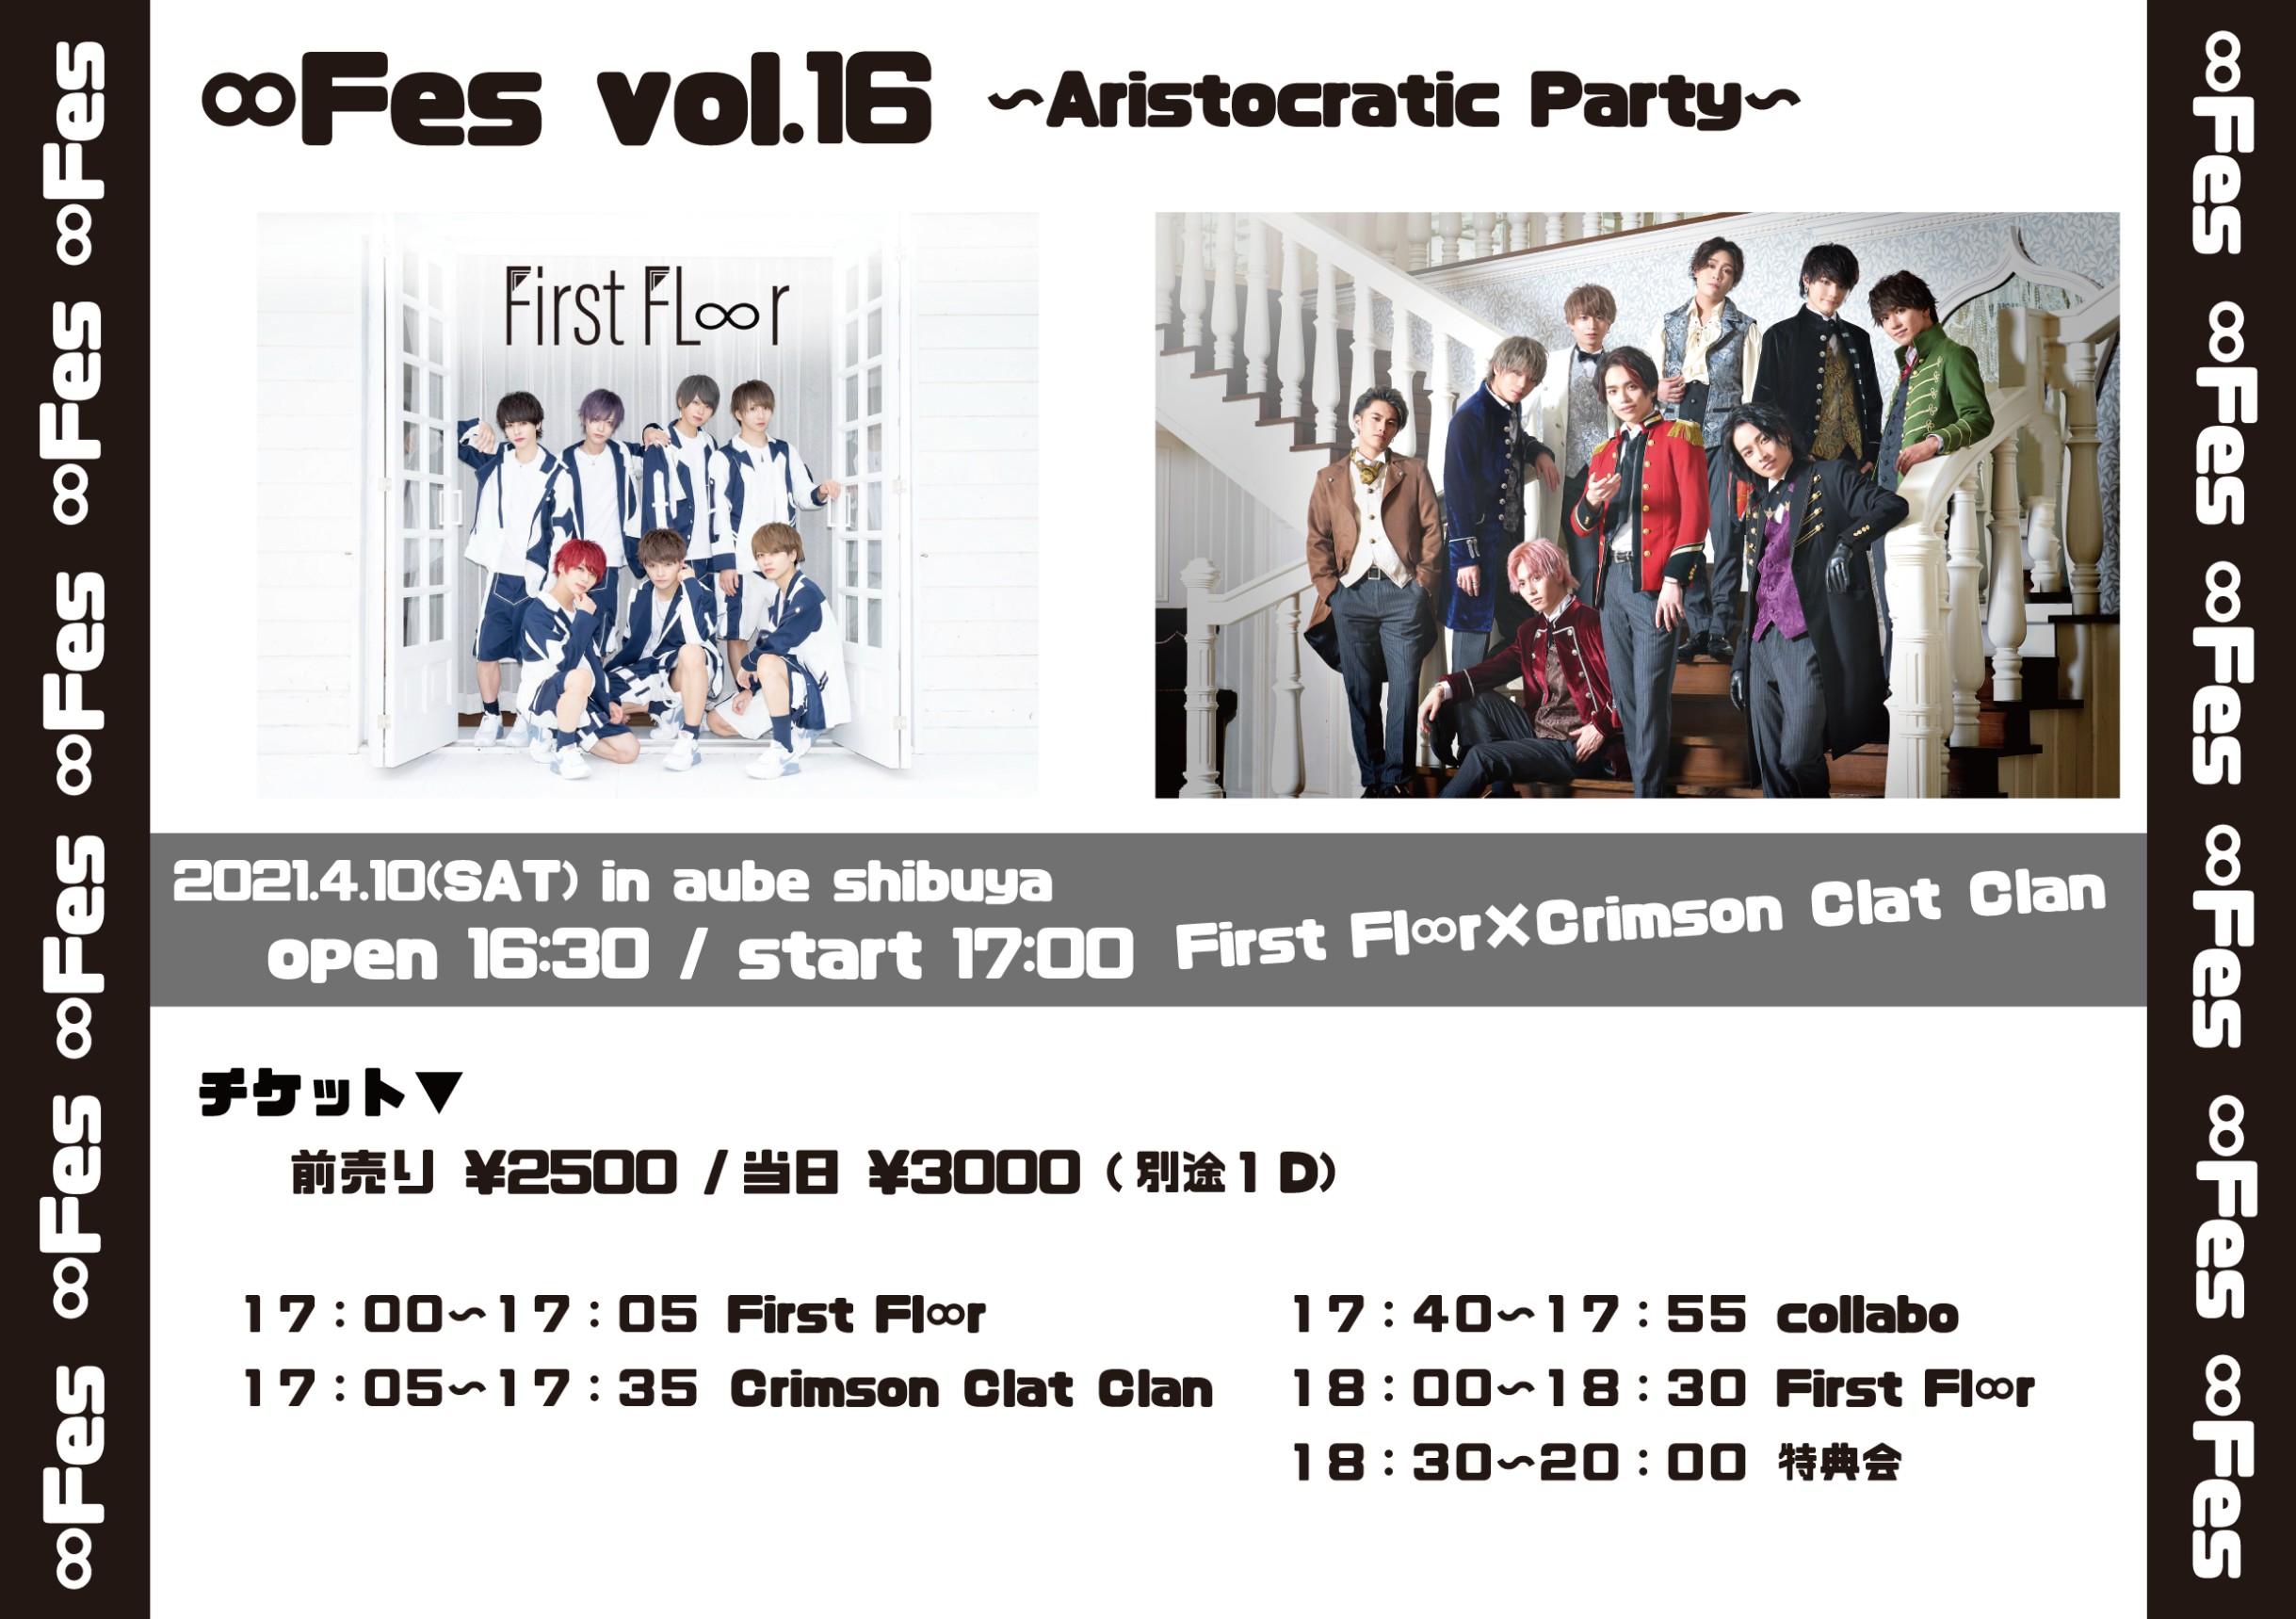 ∞Fes vol.16〜Aristocratic Party〜